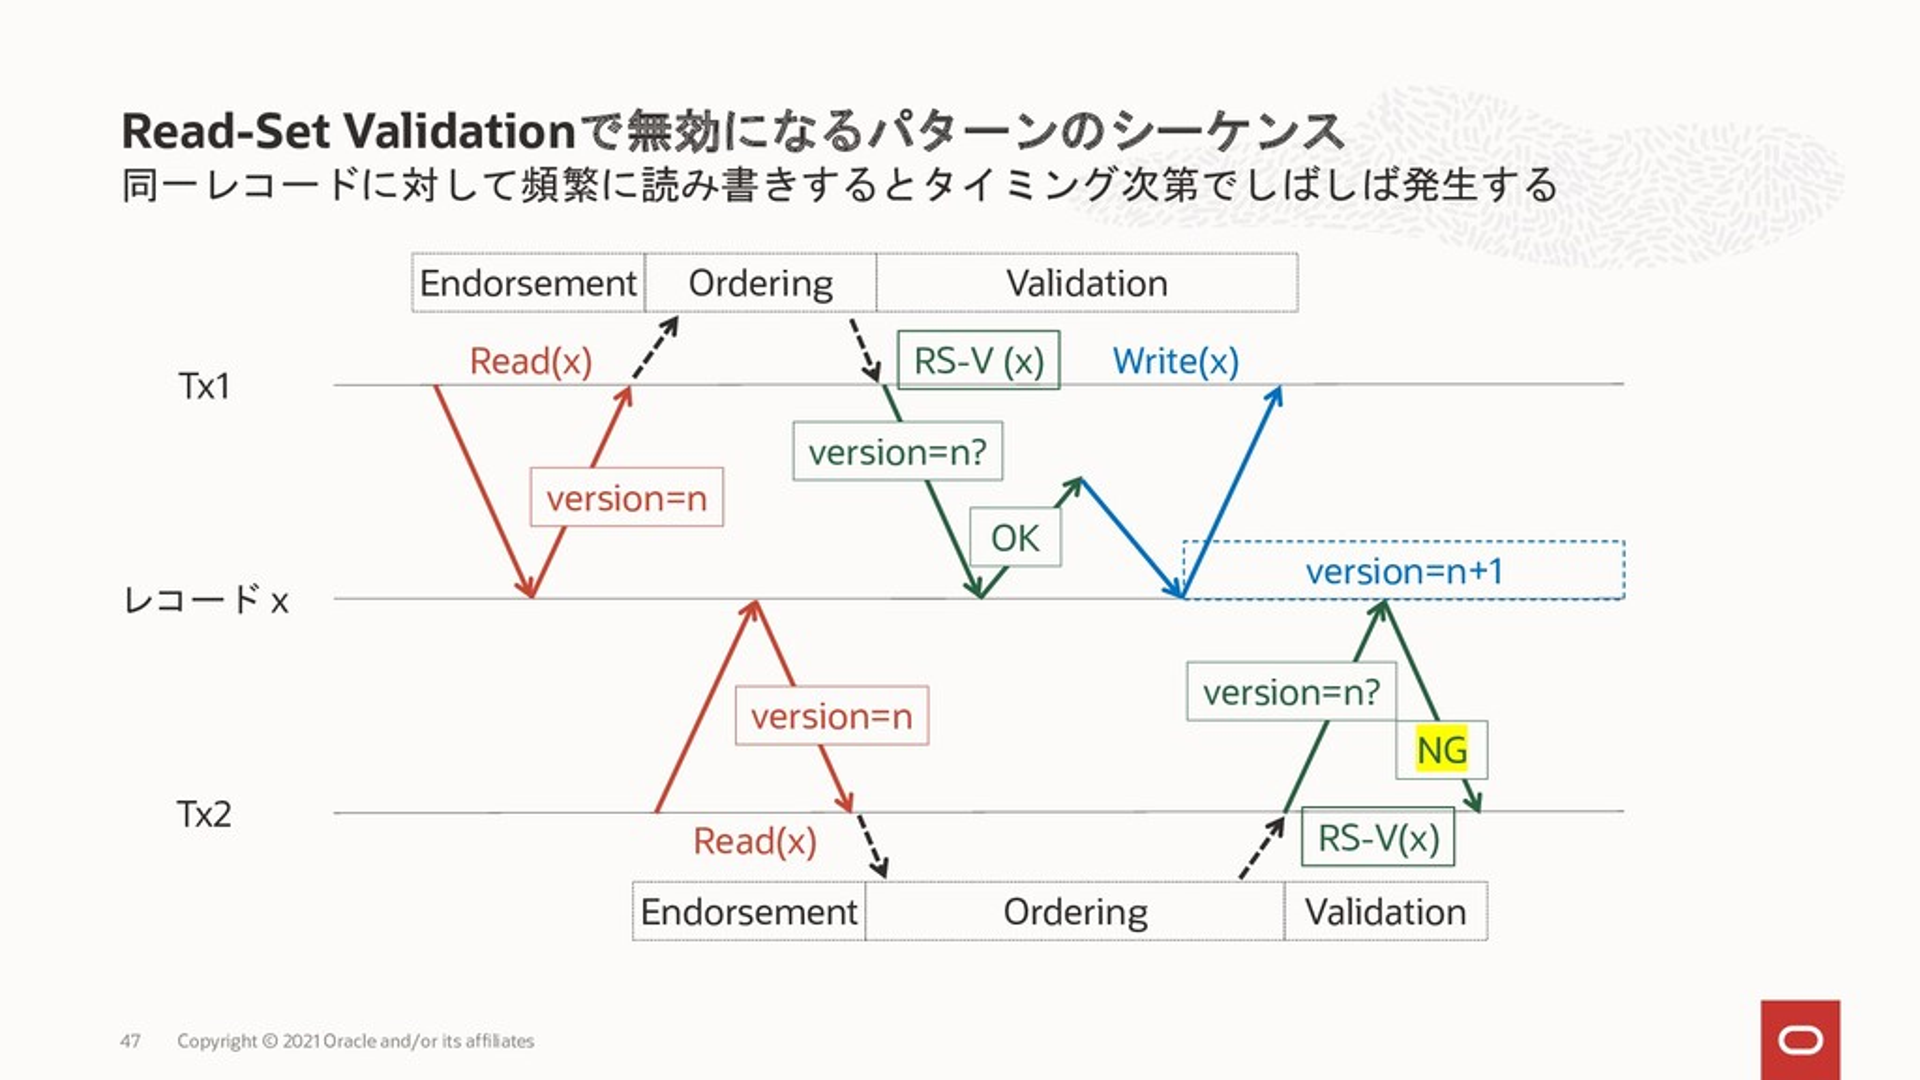 Endorsement・Ordering・Validationの3フェーズから構成 Endor...